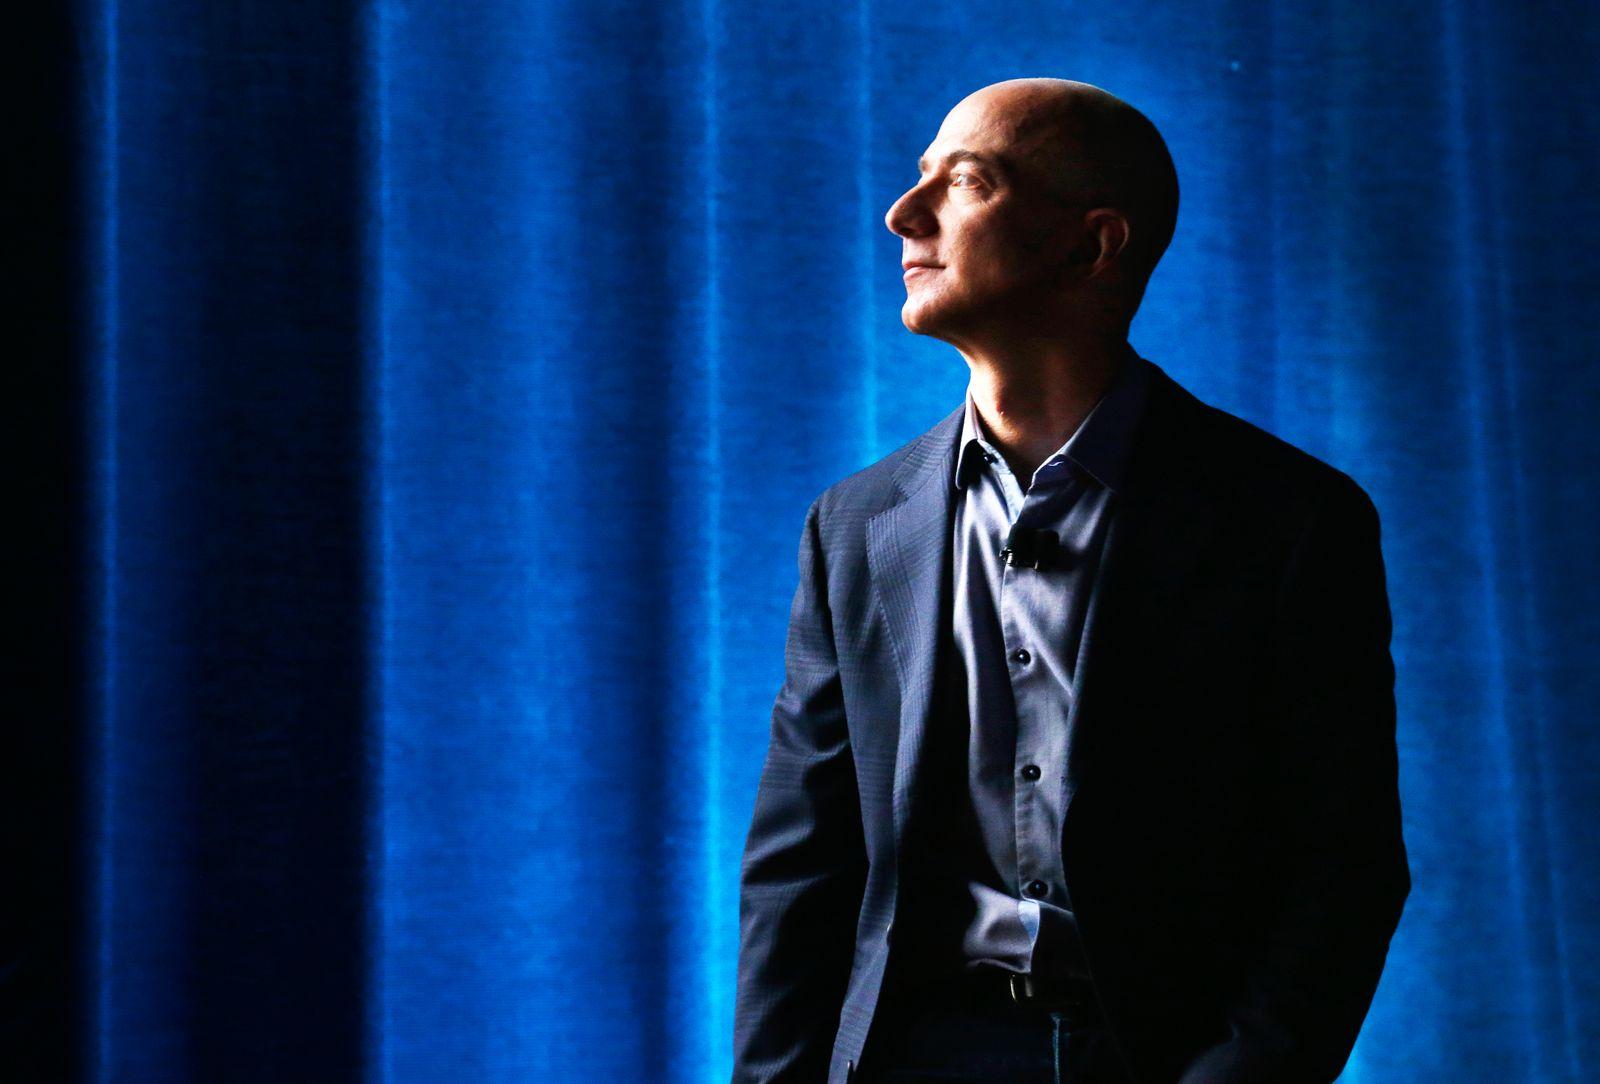 Amazon / Jeff Bezos